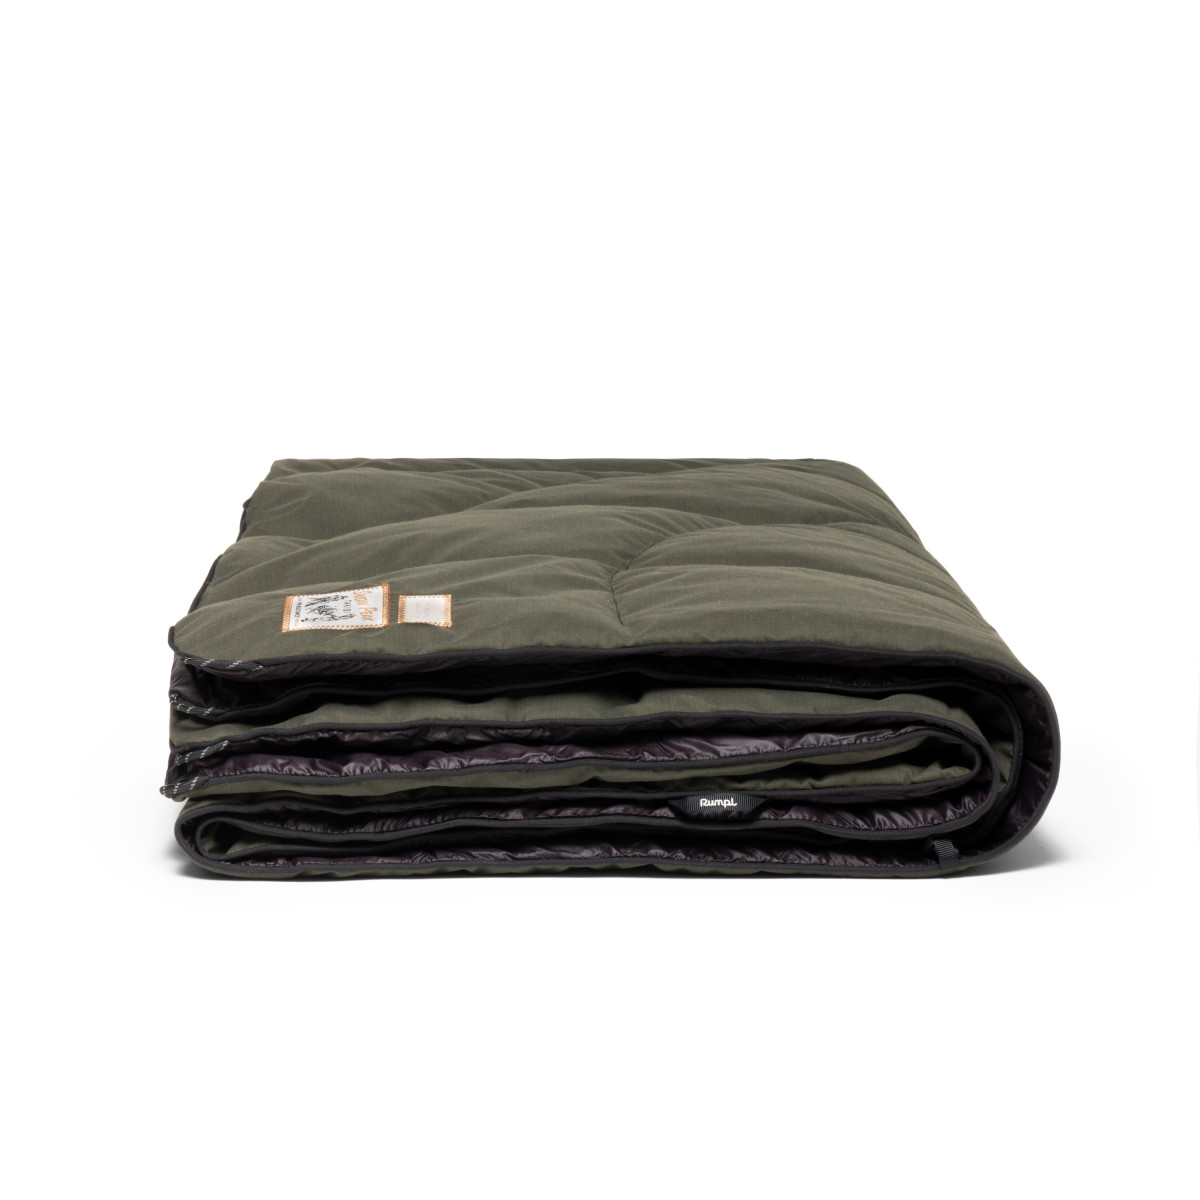 Rumpl & Snow Peak NanoLoft Takibi Fire Resistant Blanket